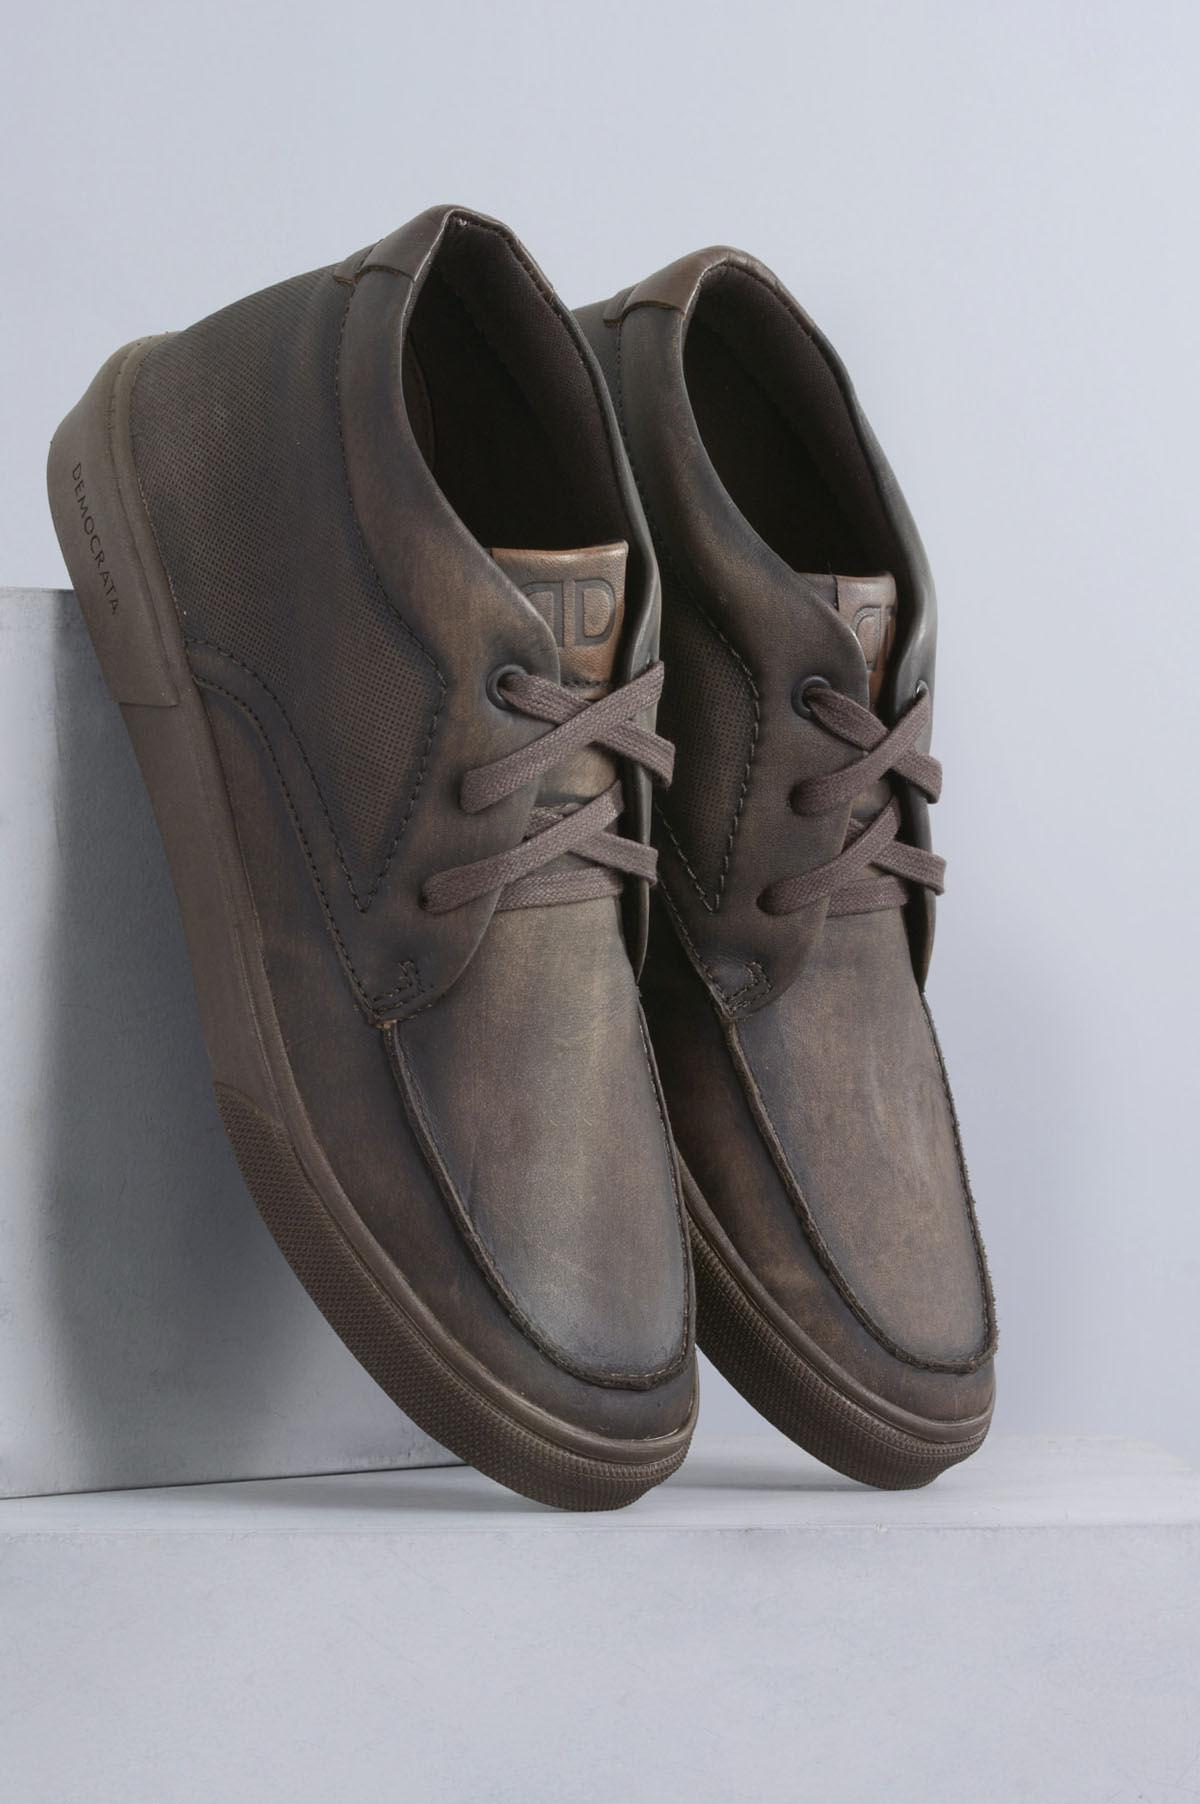 f15851dc87b Sapatênis Masculino Democrata Hit CR TABACO - Mundial Calçados